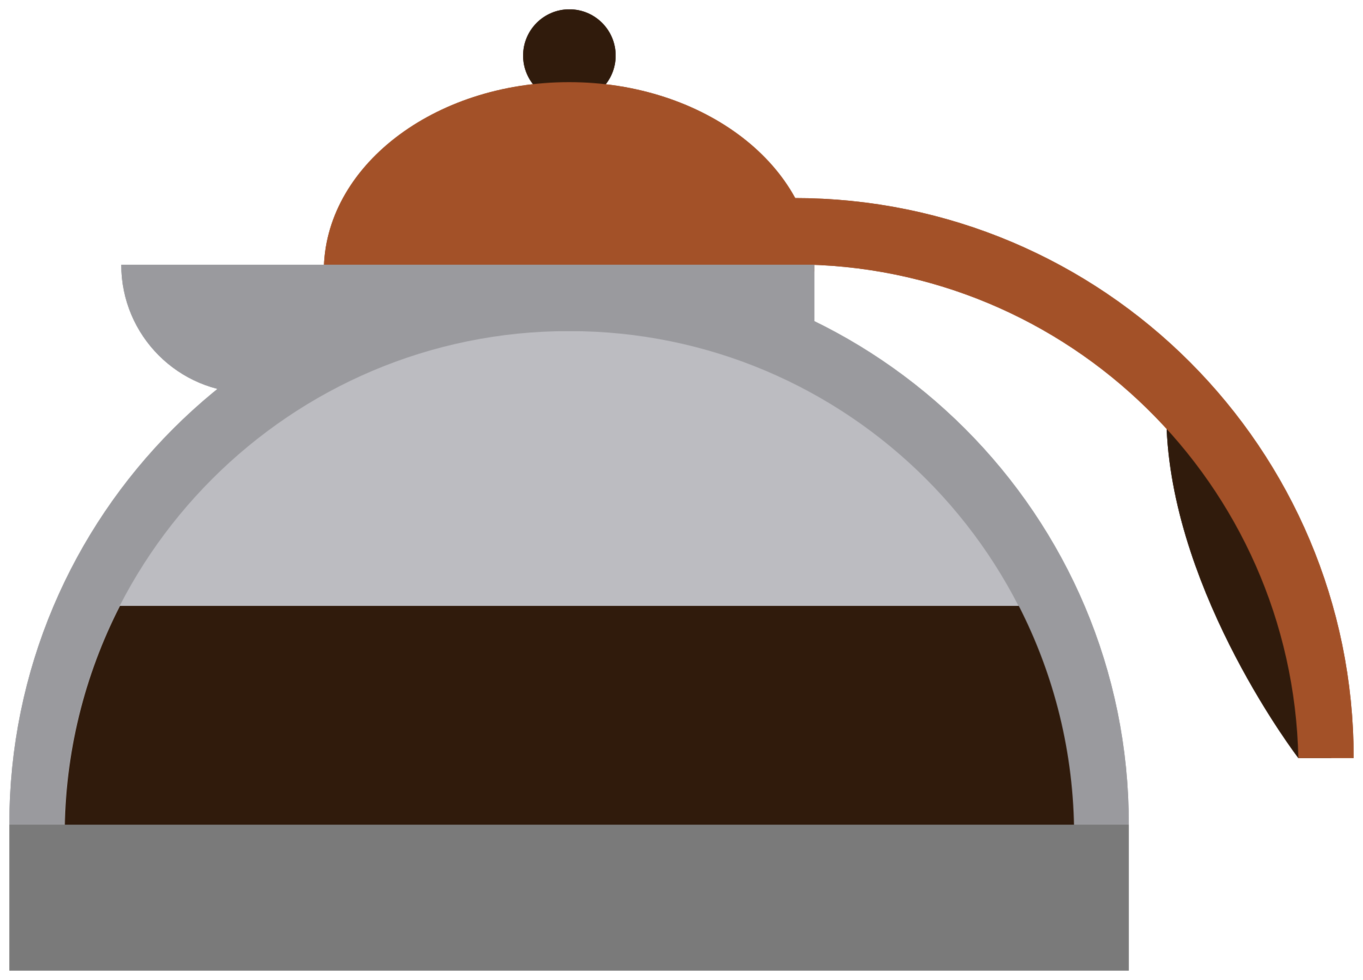 caffettiera png